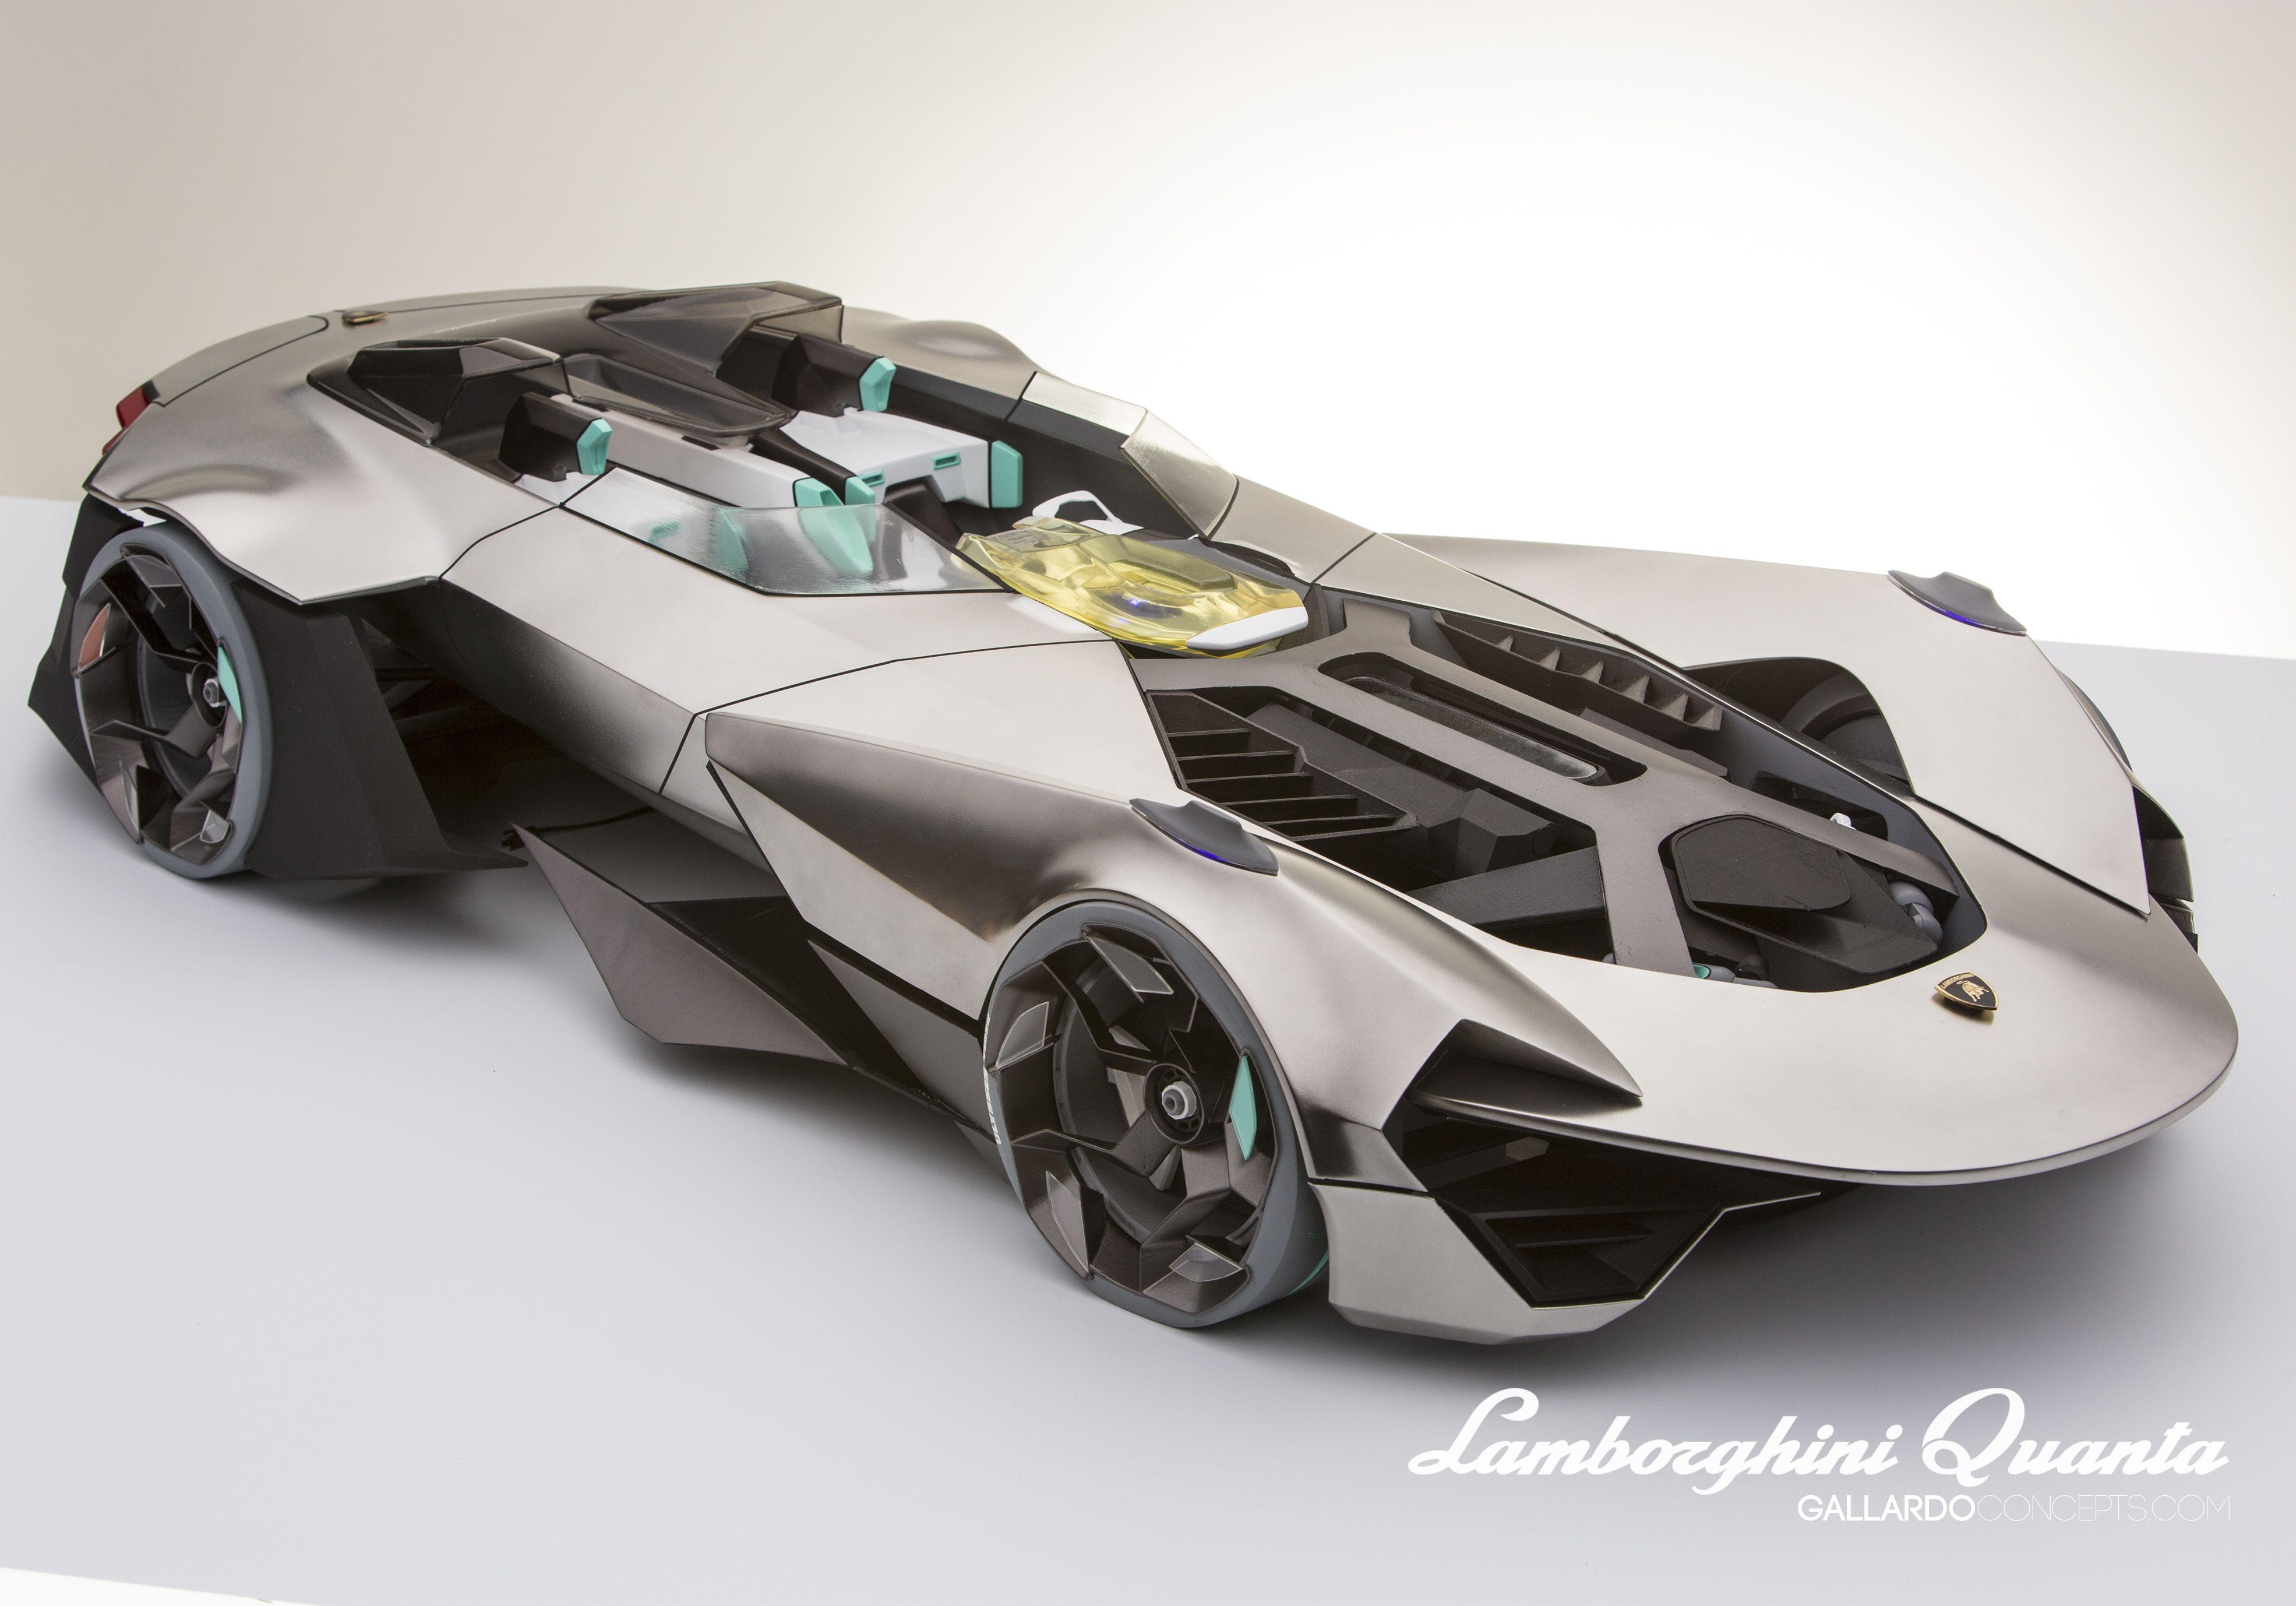 Lamborghini Quanta Lp 1000 4 Thesis Project From Art Center College